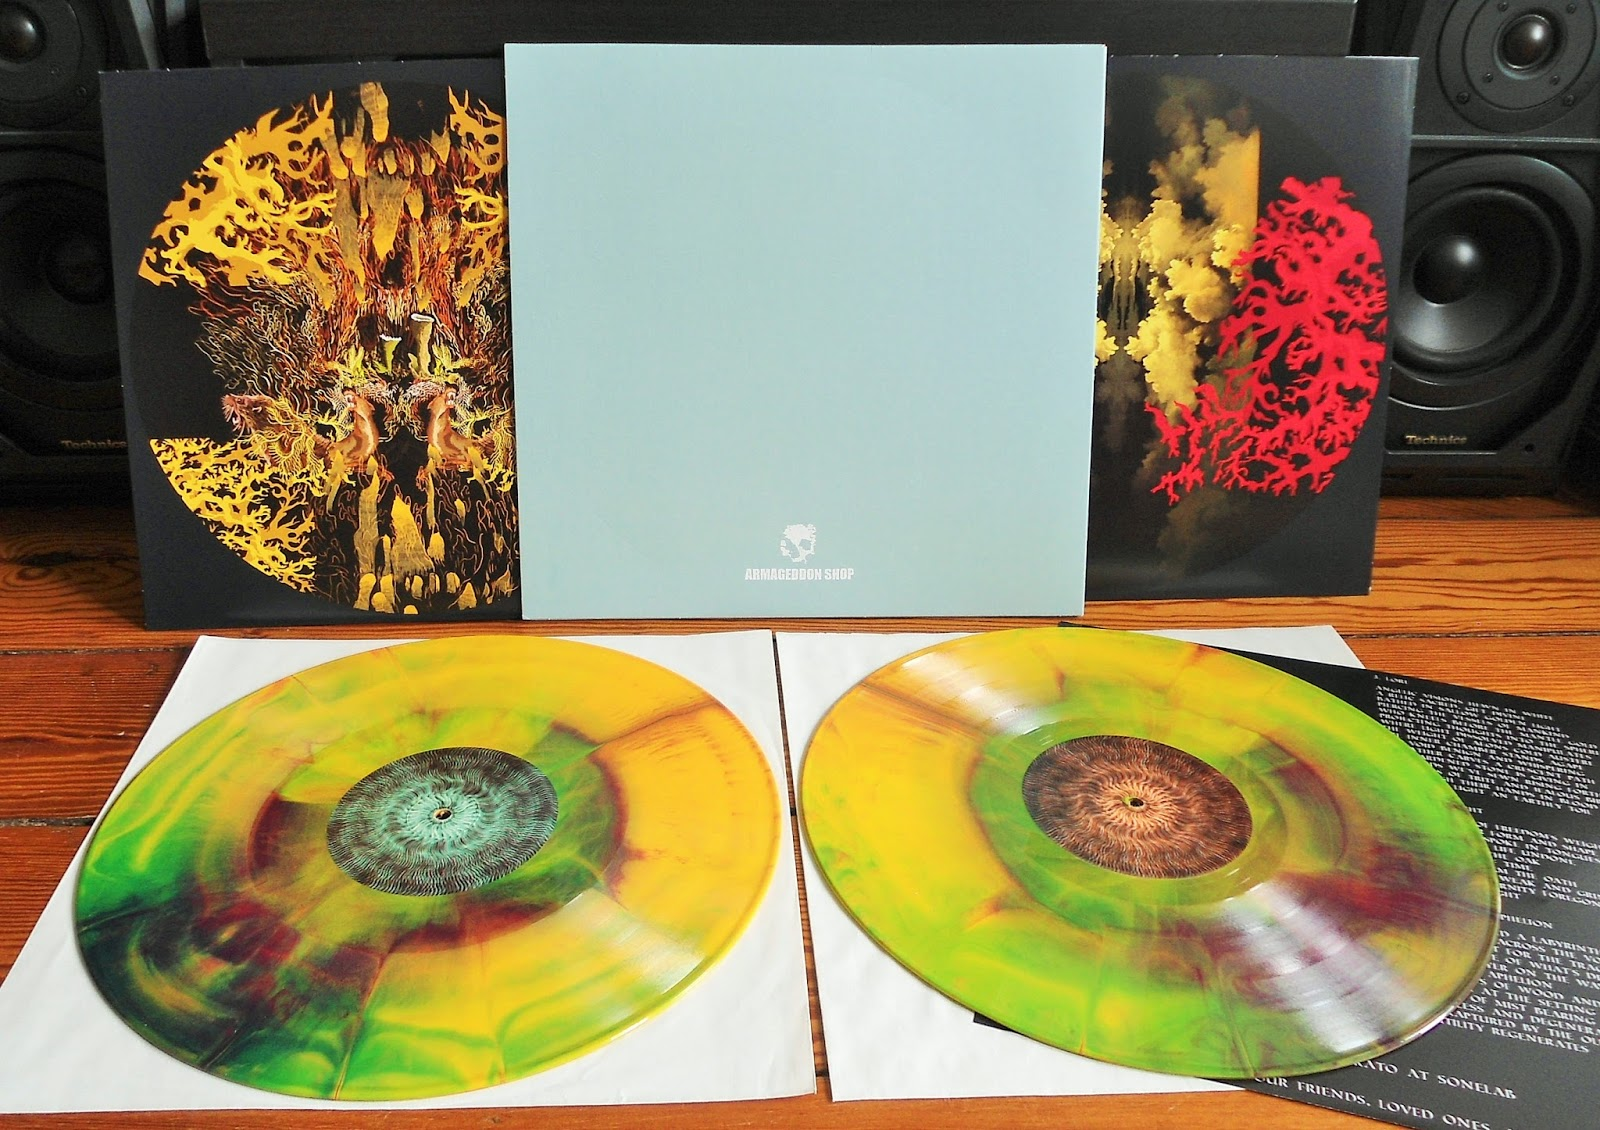 Hardcore Metal Vinyl Elder Lore Armageddon Pressing